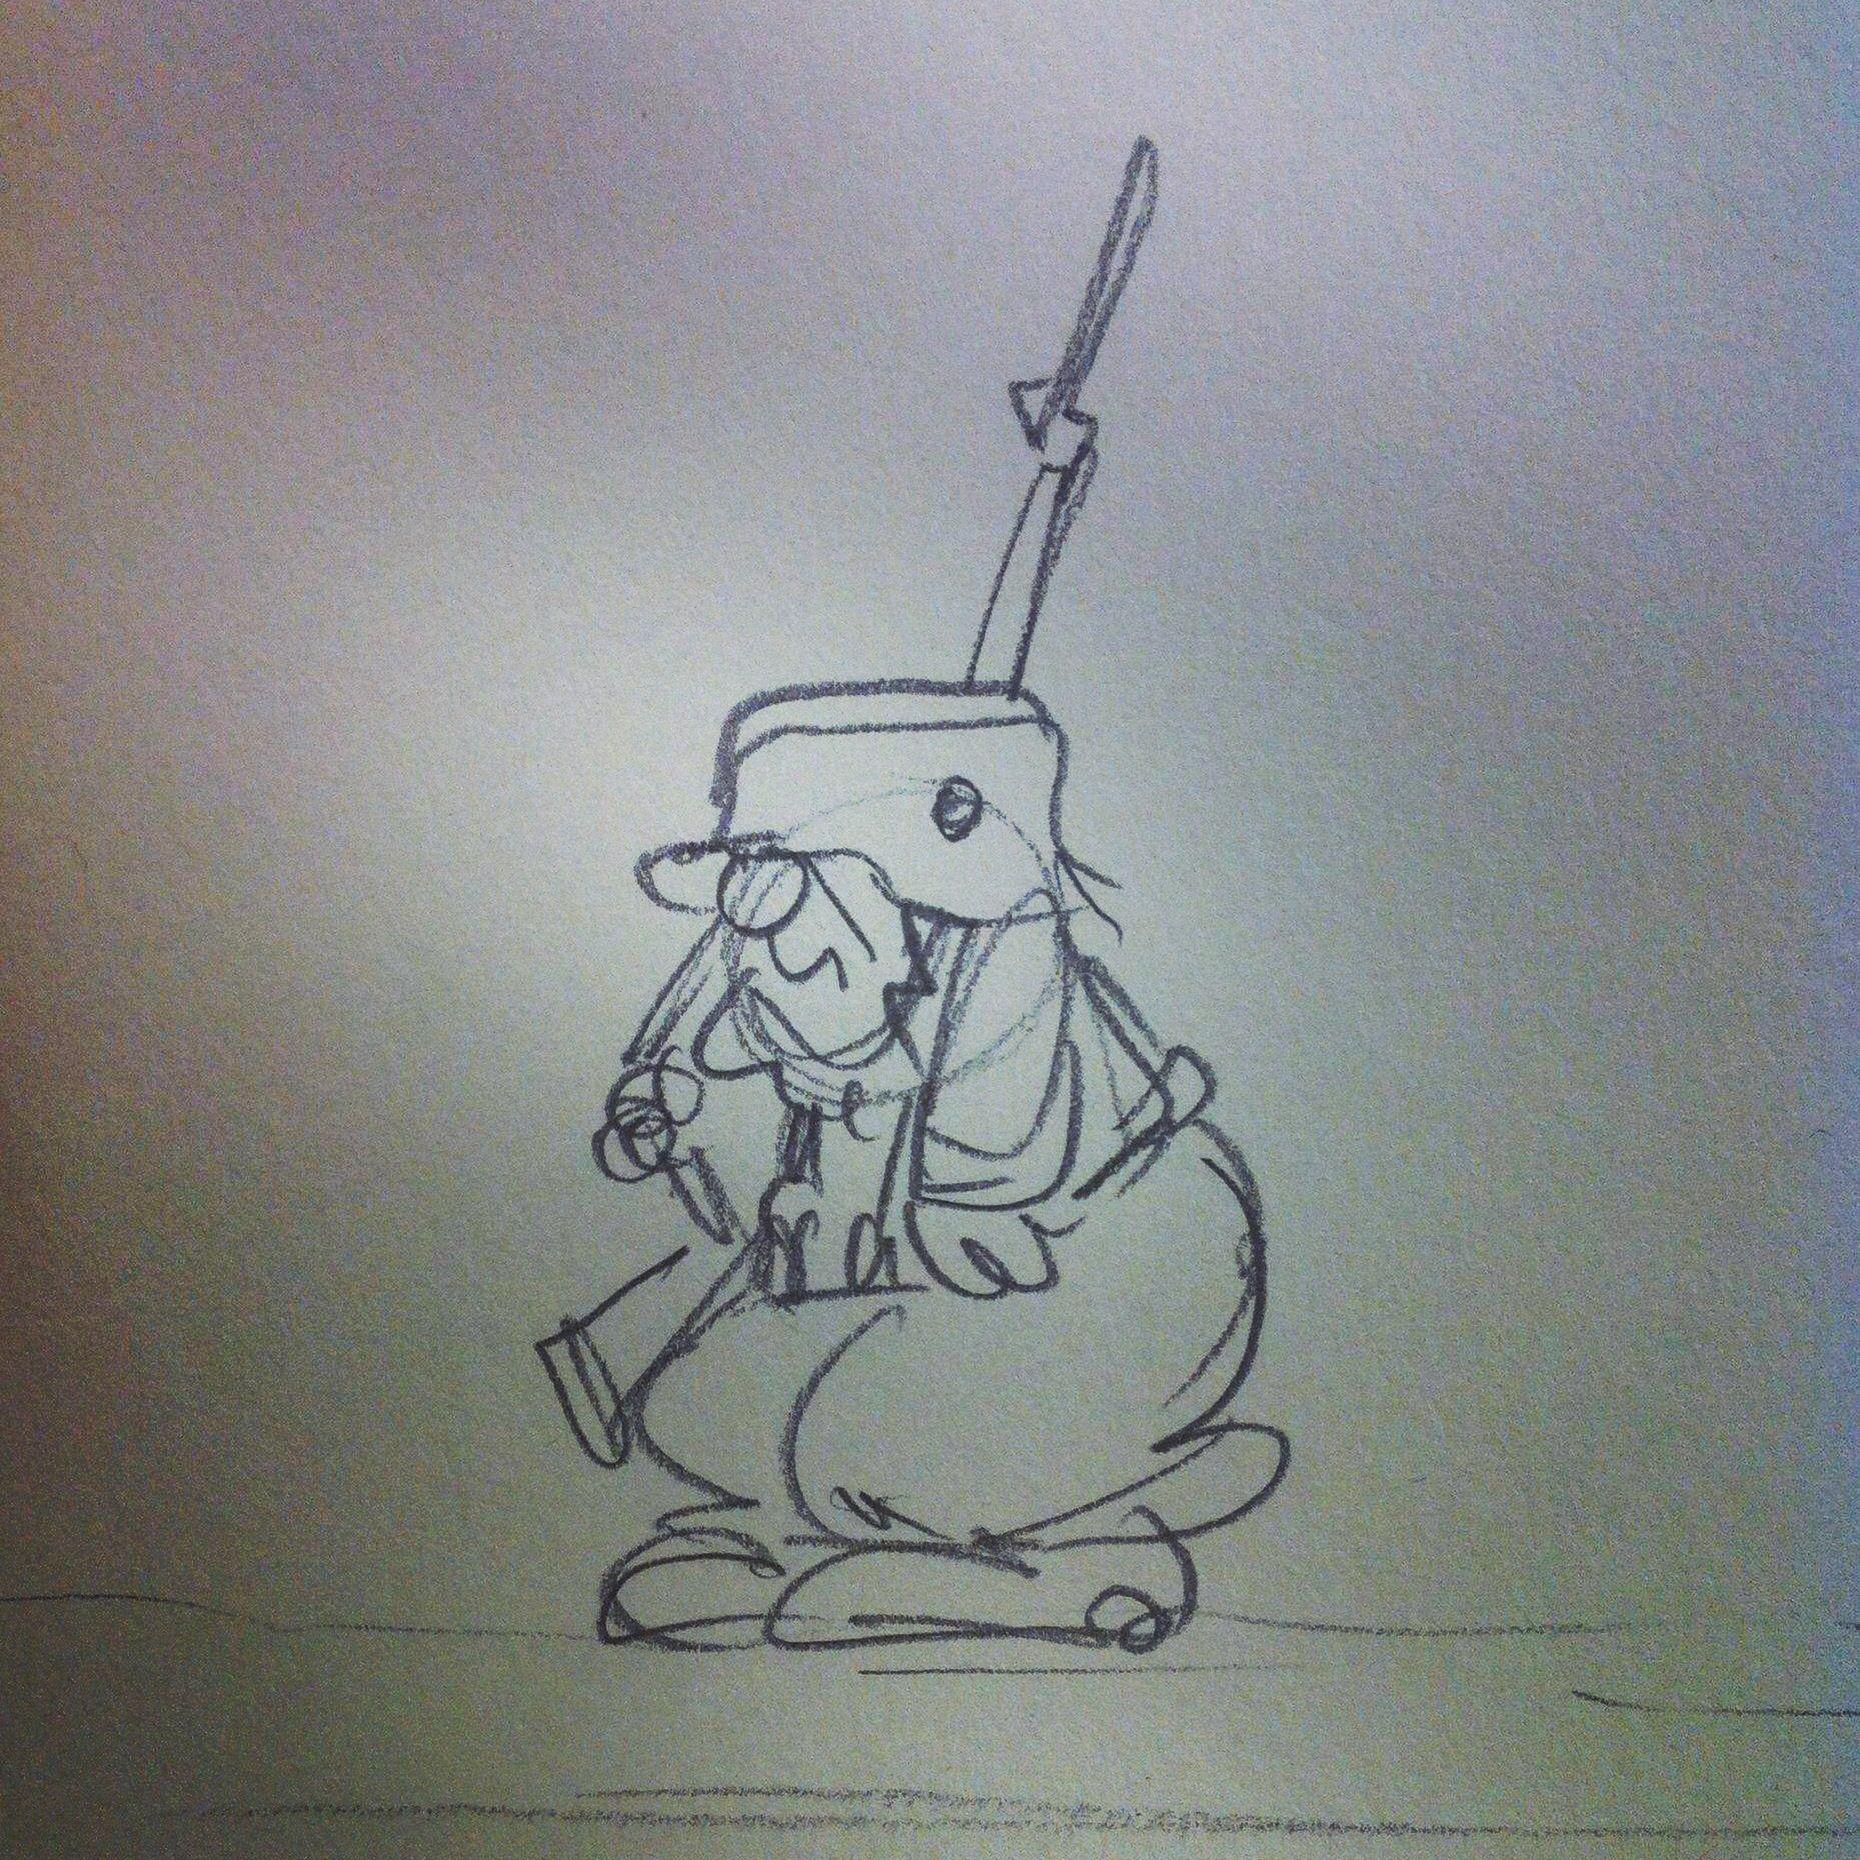 Alan ford gruppo t n t ubc enciclopedia online del fumetto - Sturmtruppen By Bonvi Storyboard For Supergulp 1981